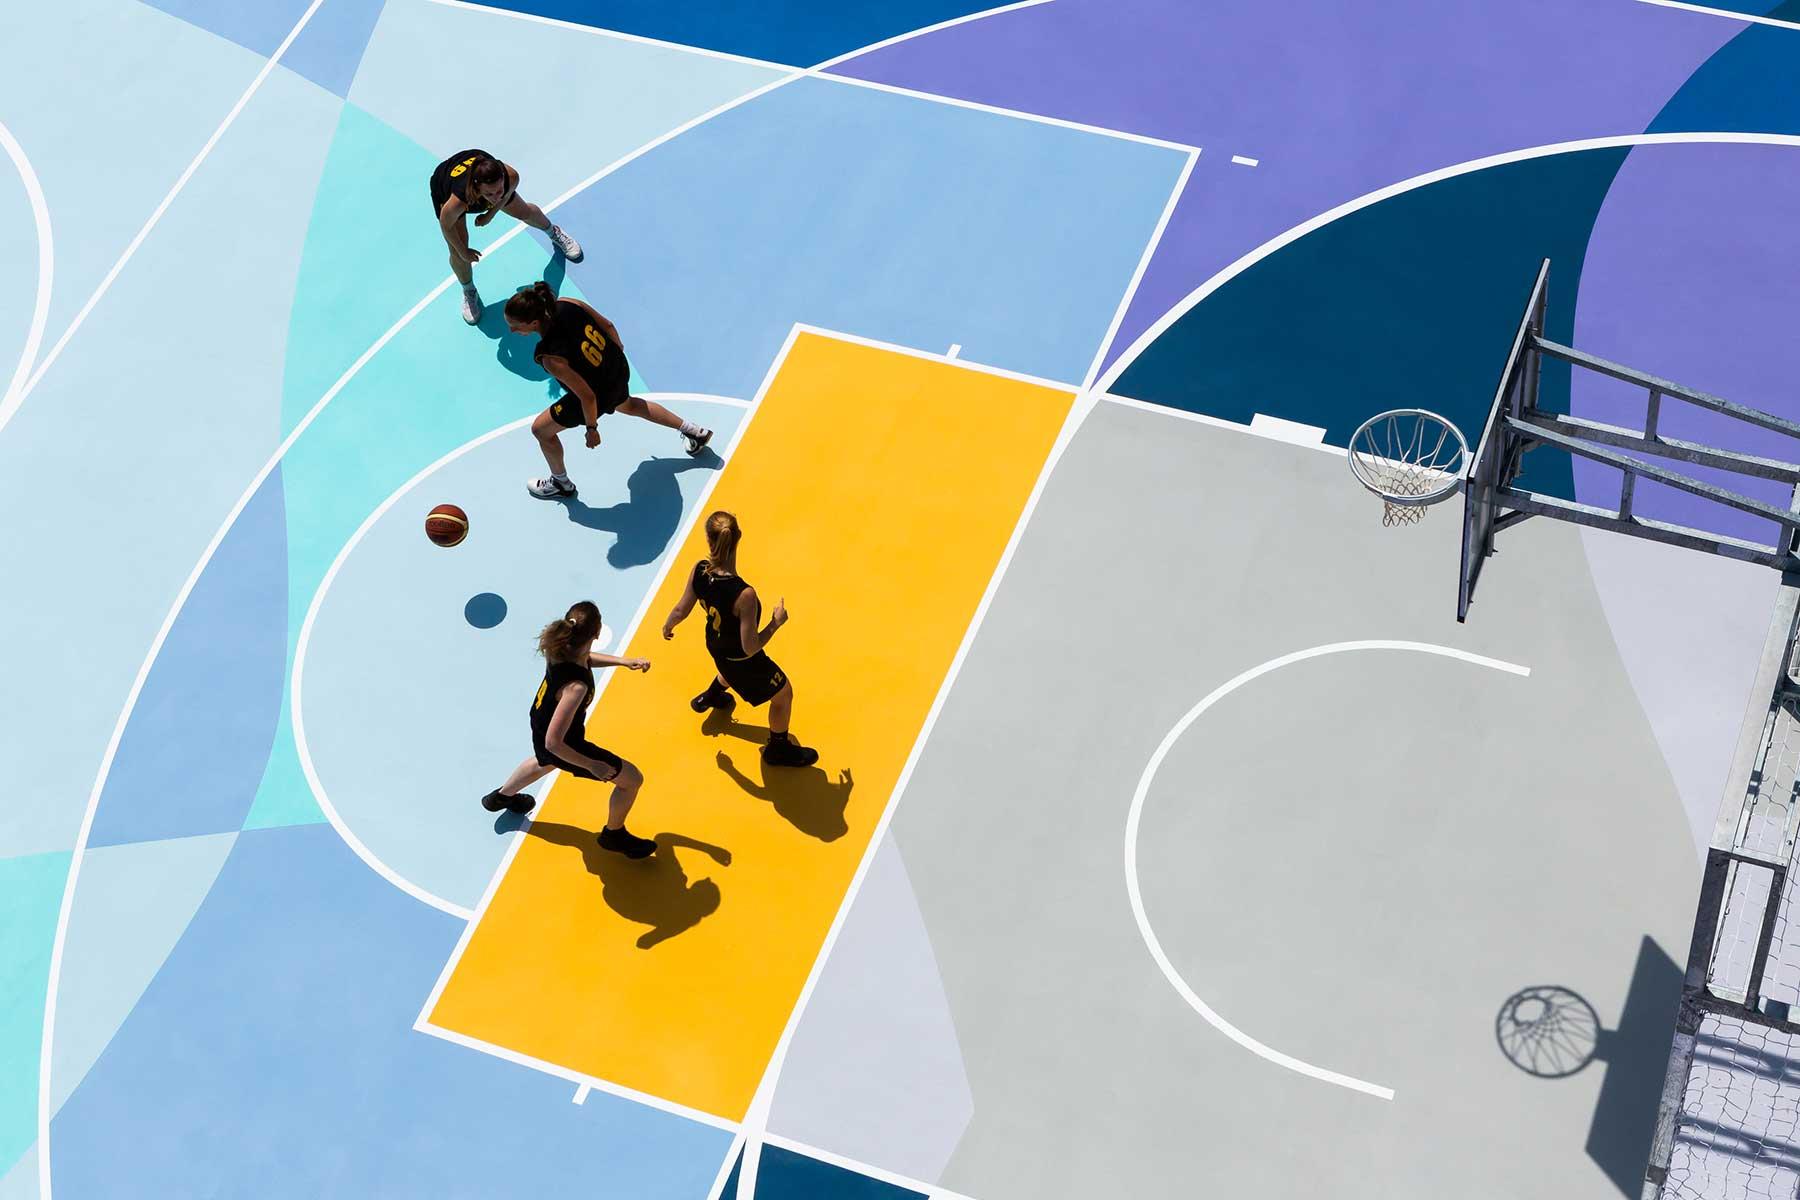 Farbenfrohe Basketballplätze von Gummy Gue Gummy-Gue-bunter-basketballplatz-Buccinasco_03